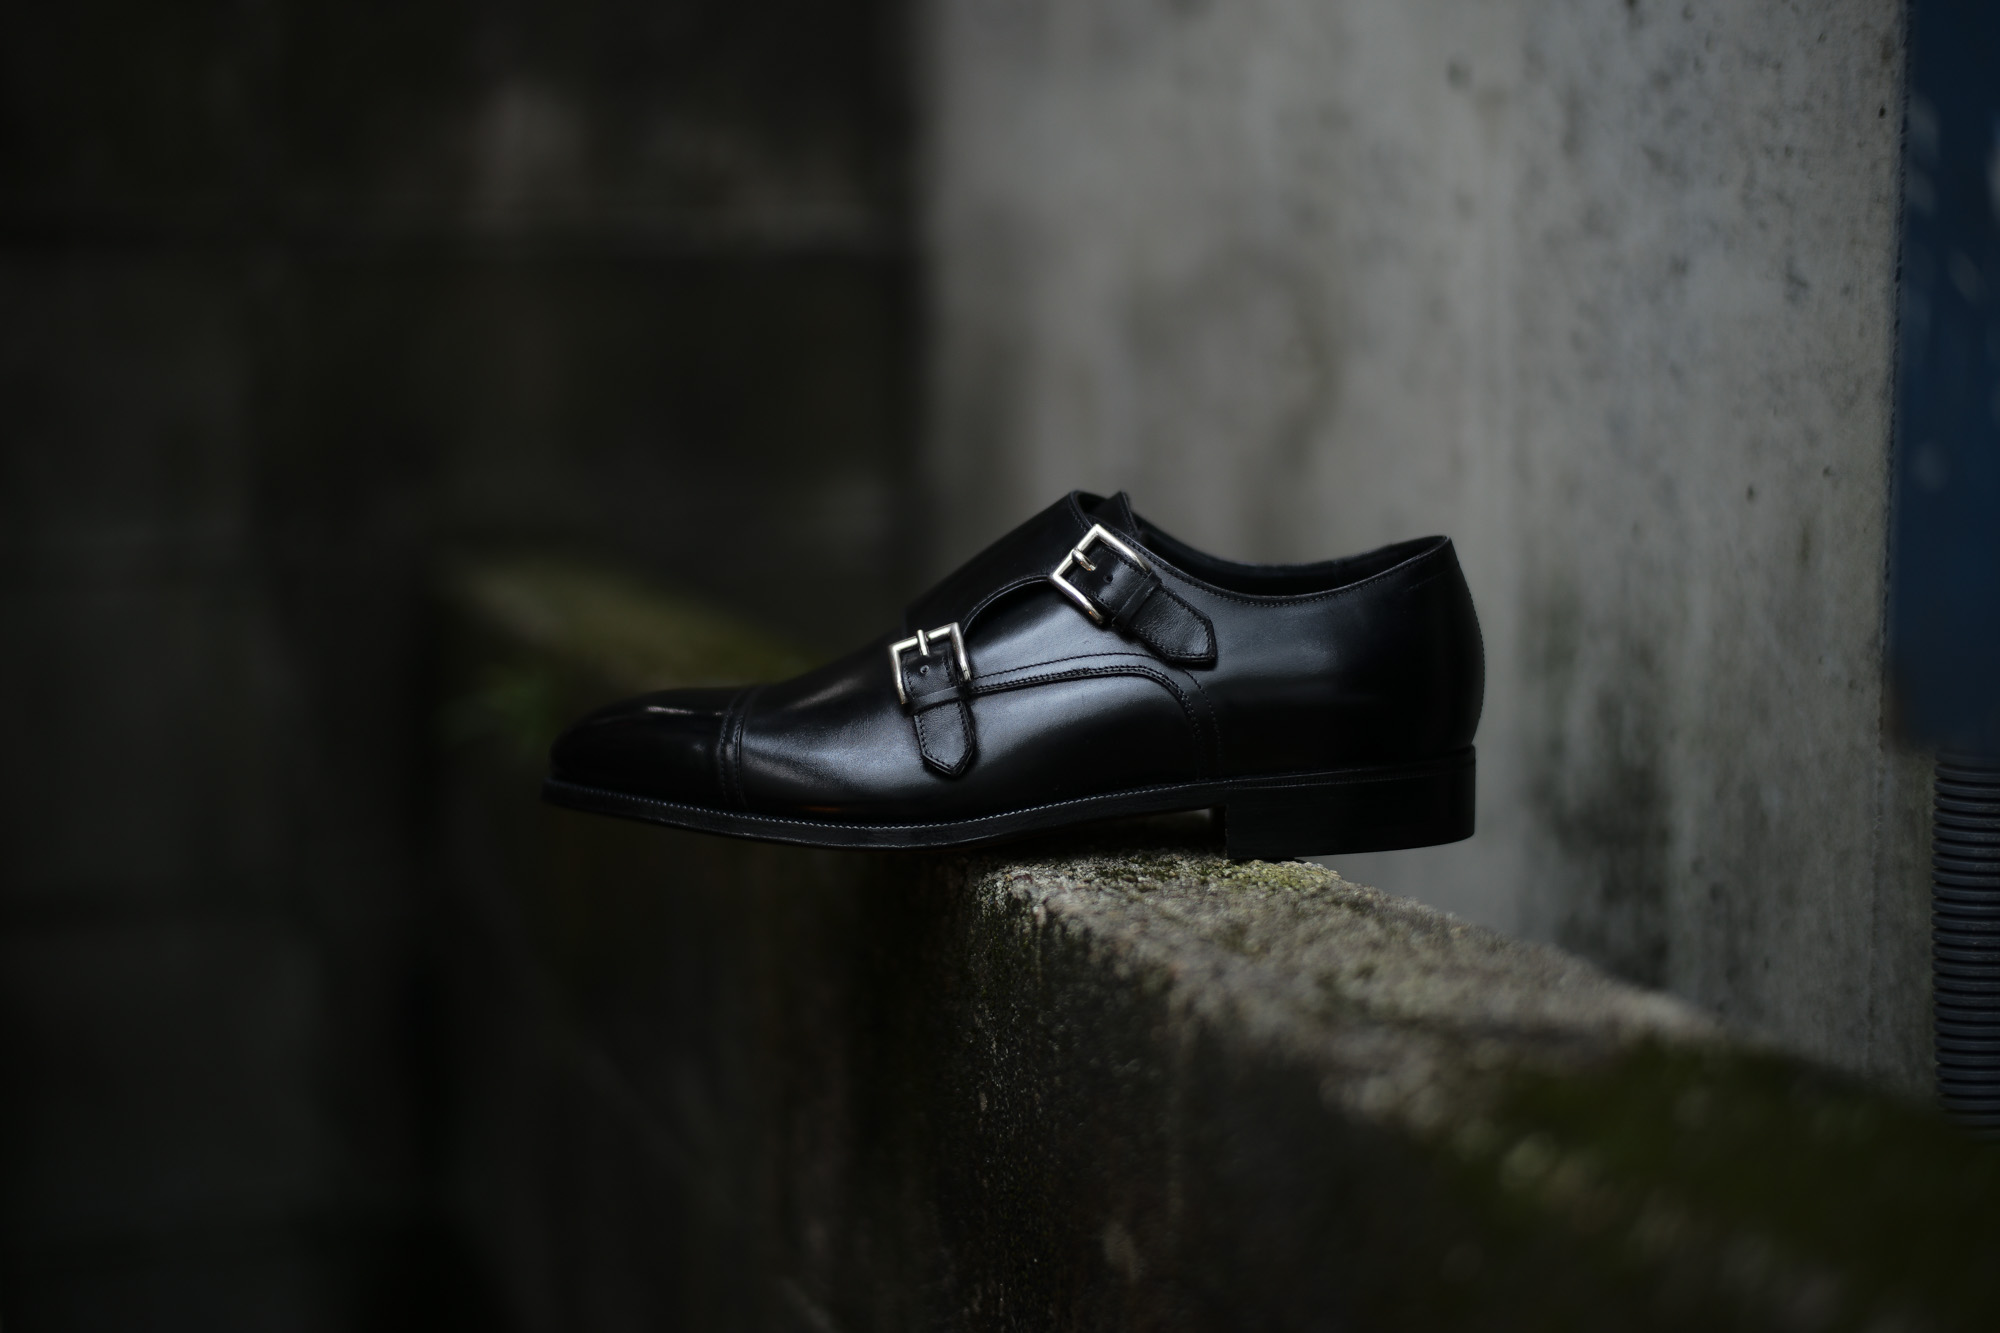 ENZO BONAFE (エンツォボナフェ) ART.EB-02 Double Monk Strap Shoes Horween Shell Cordovan Leather ホーウィン社シェルコードバンレザー ダブルモンクストラップシューズ NERO (ブラック) made in italy (イタリア製) 2019春夏 enzobonafe eb02 ダブルモンク コードバン 愛知 名古屋 Alto e Diritto アルト エ デリット alto e diritto altoediritto アルトエデリット